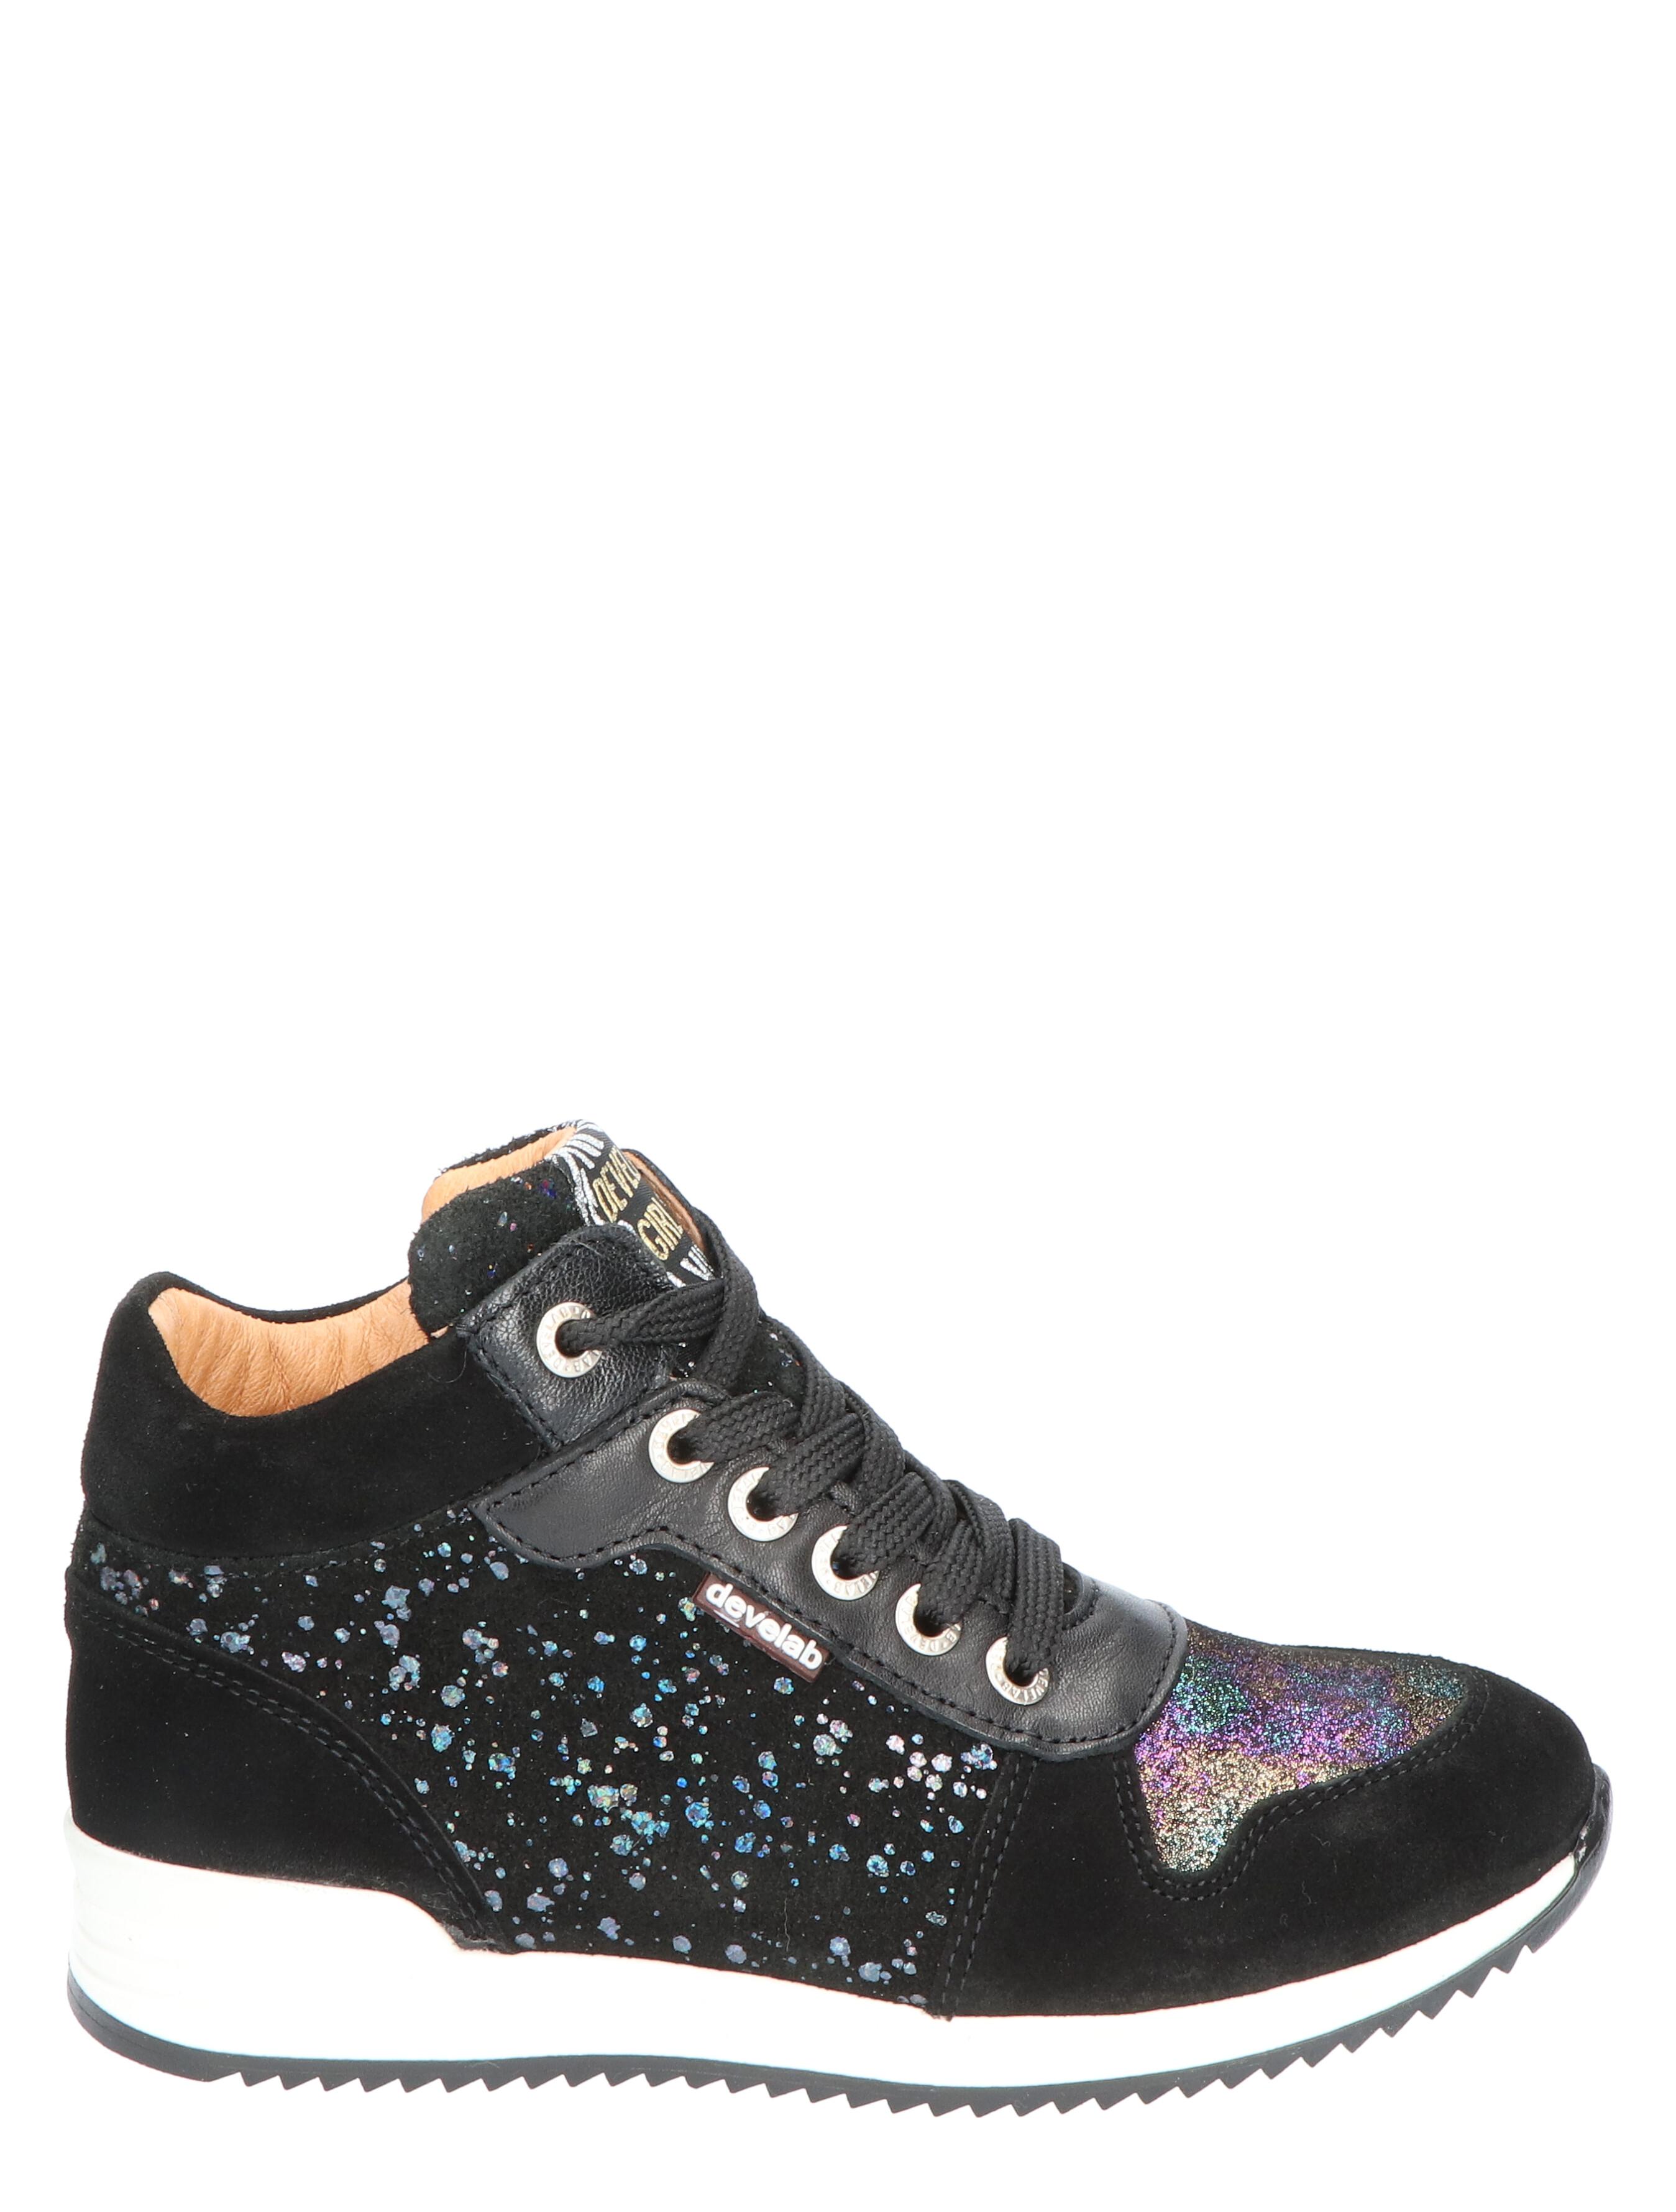 Develab 41624 081 Multicolour Metallic Sneakers hoge-sneakers